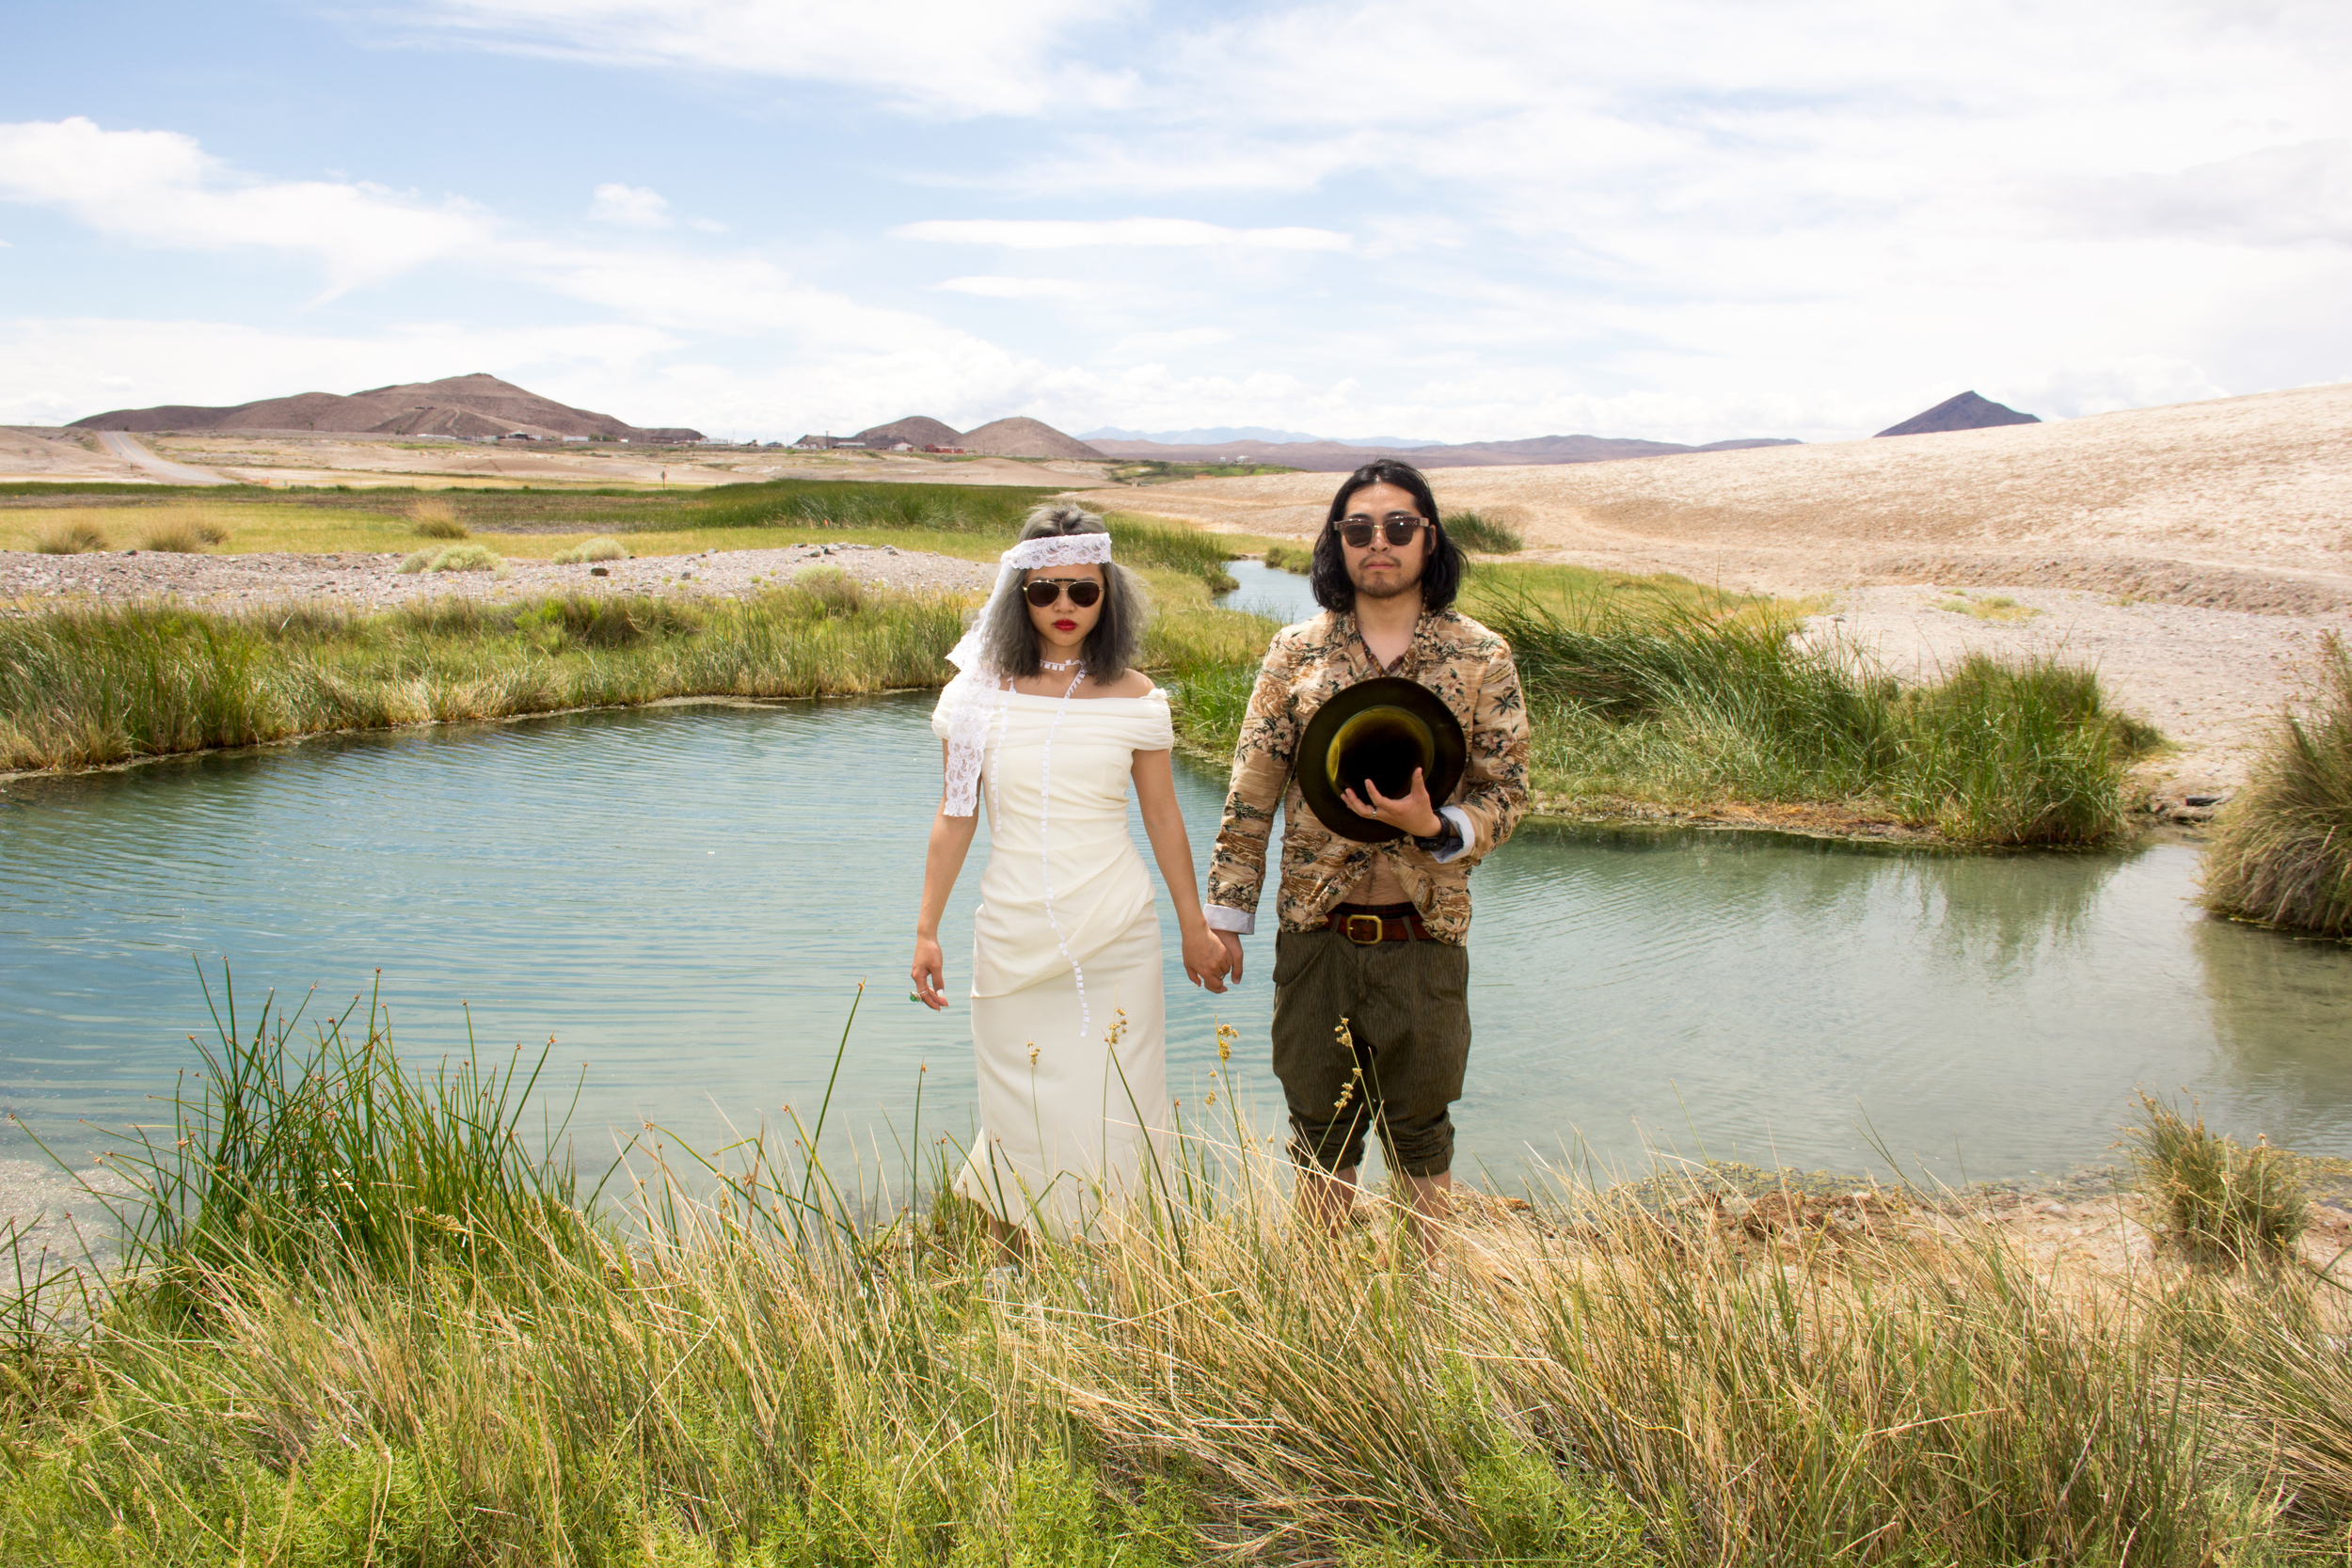 Wedding at Death Valley